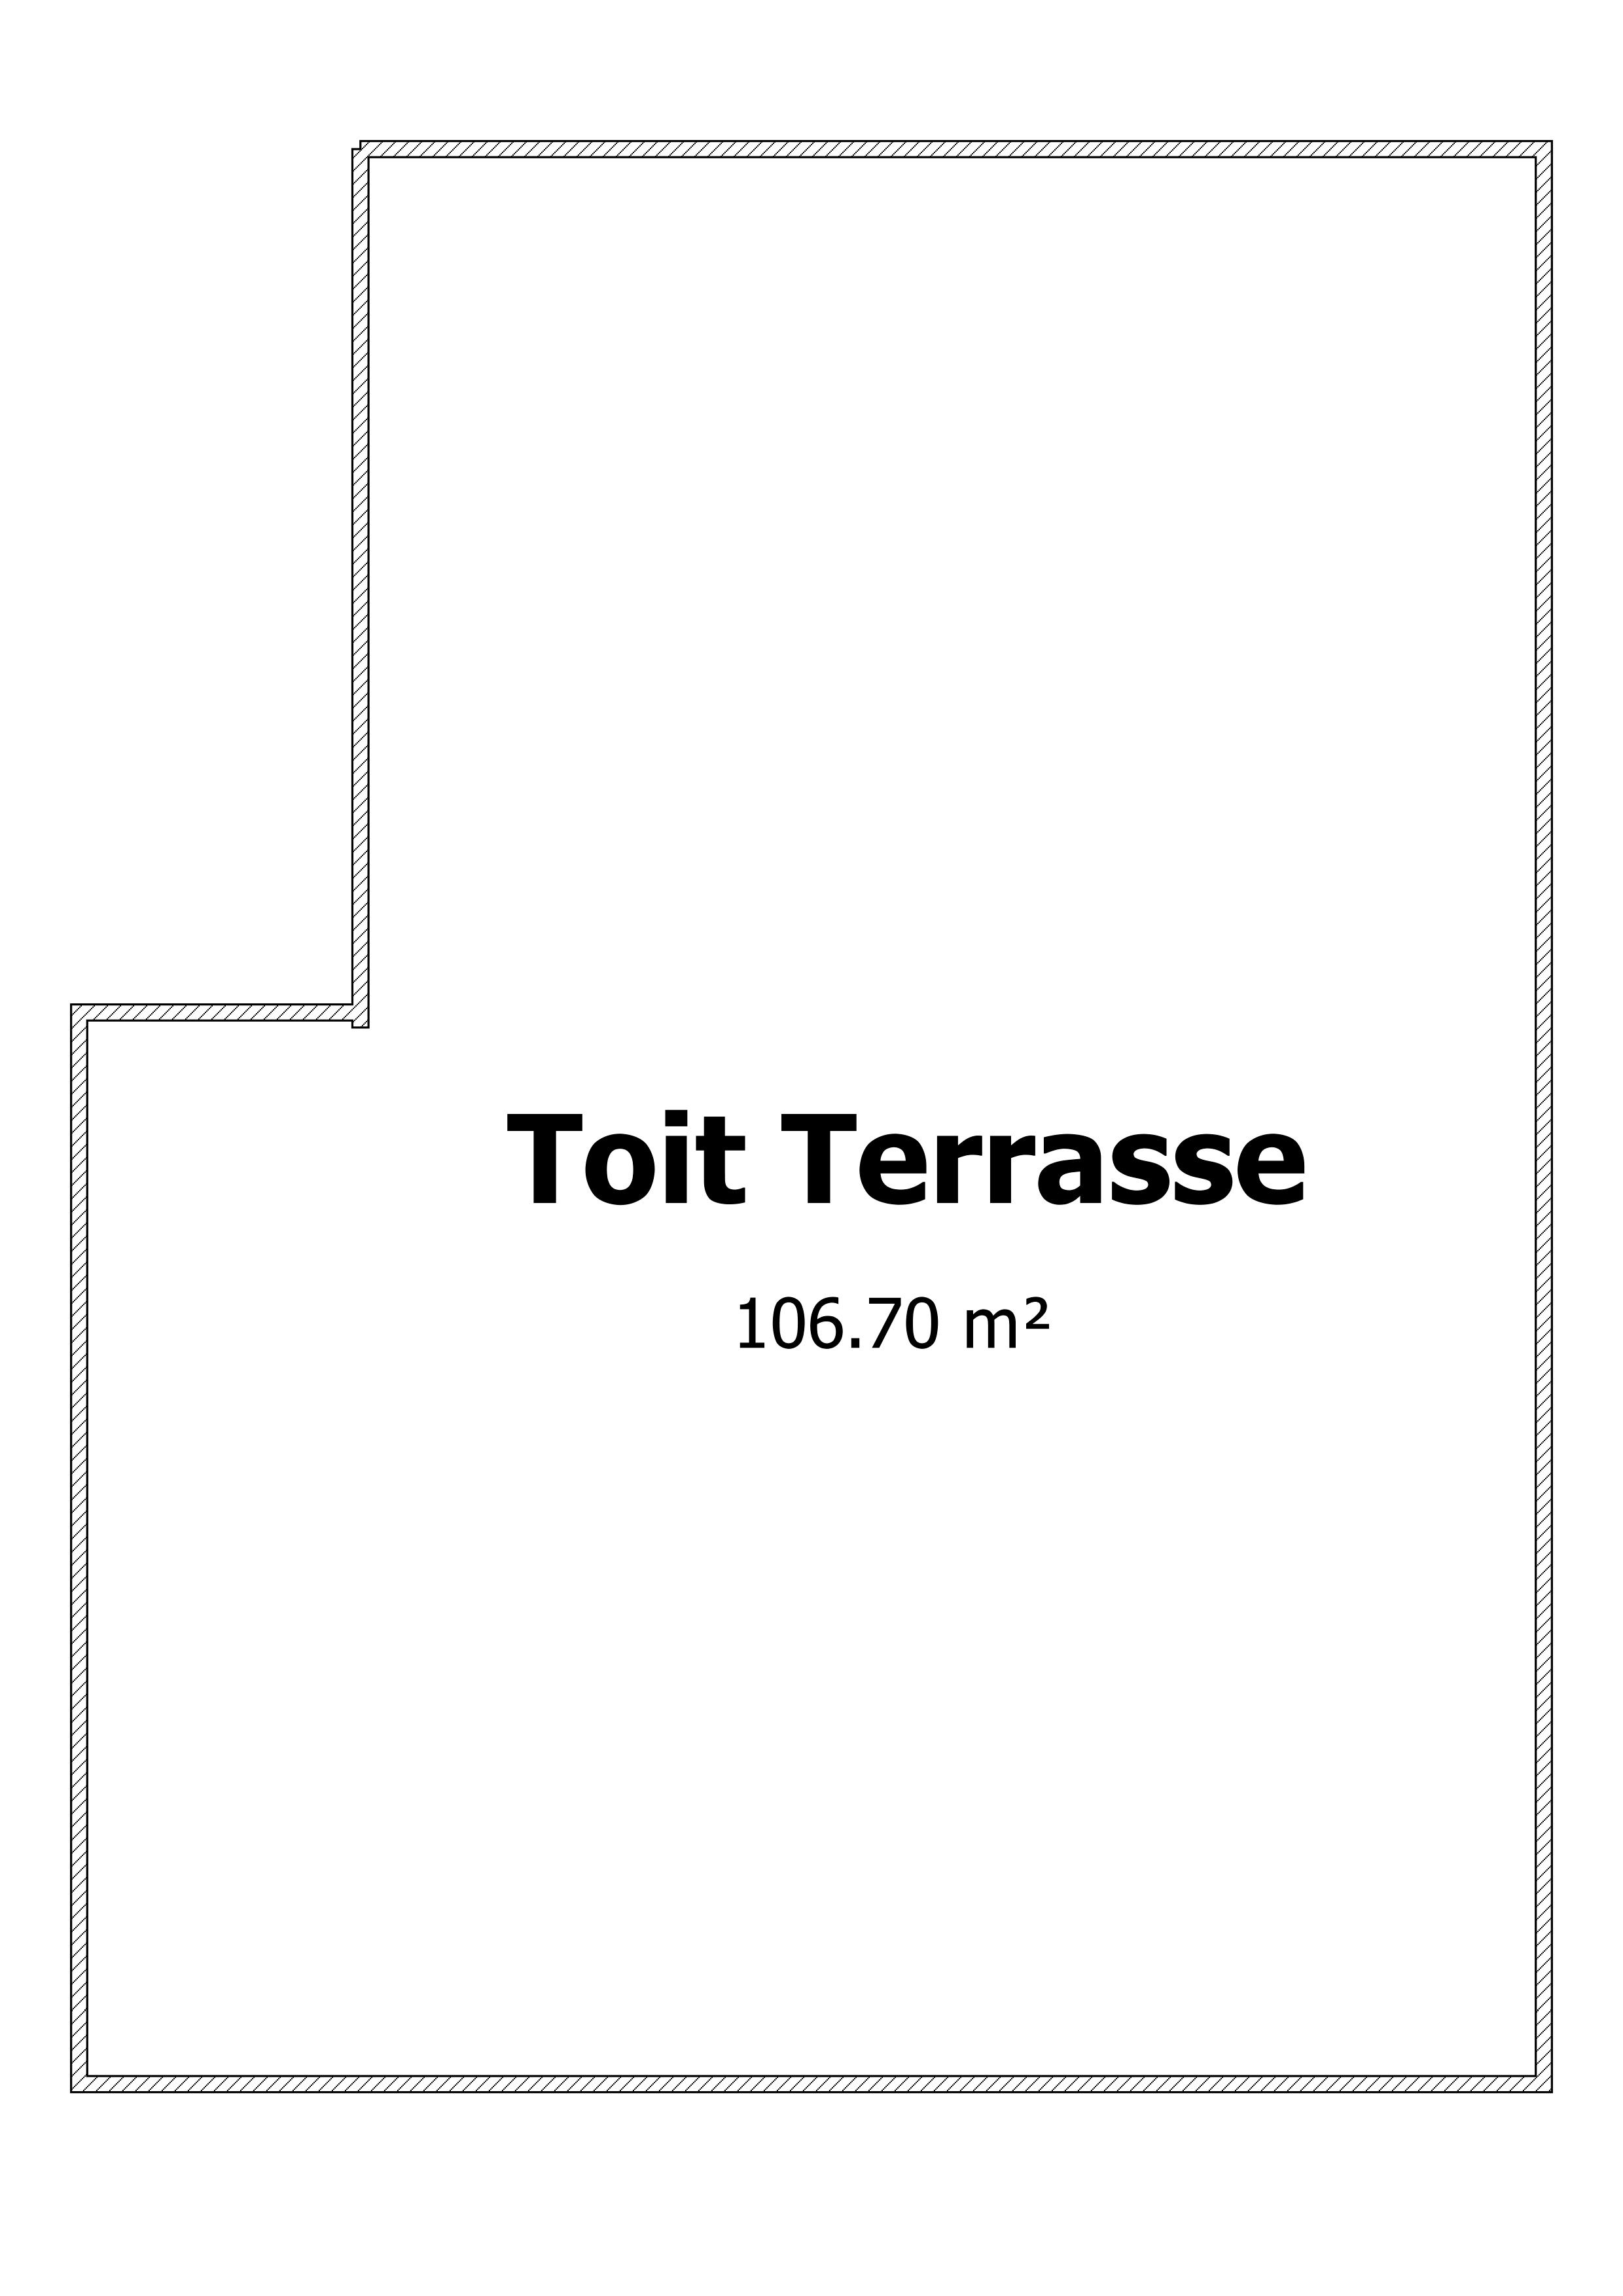 Plan Toit Terrasse